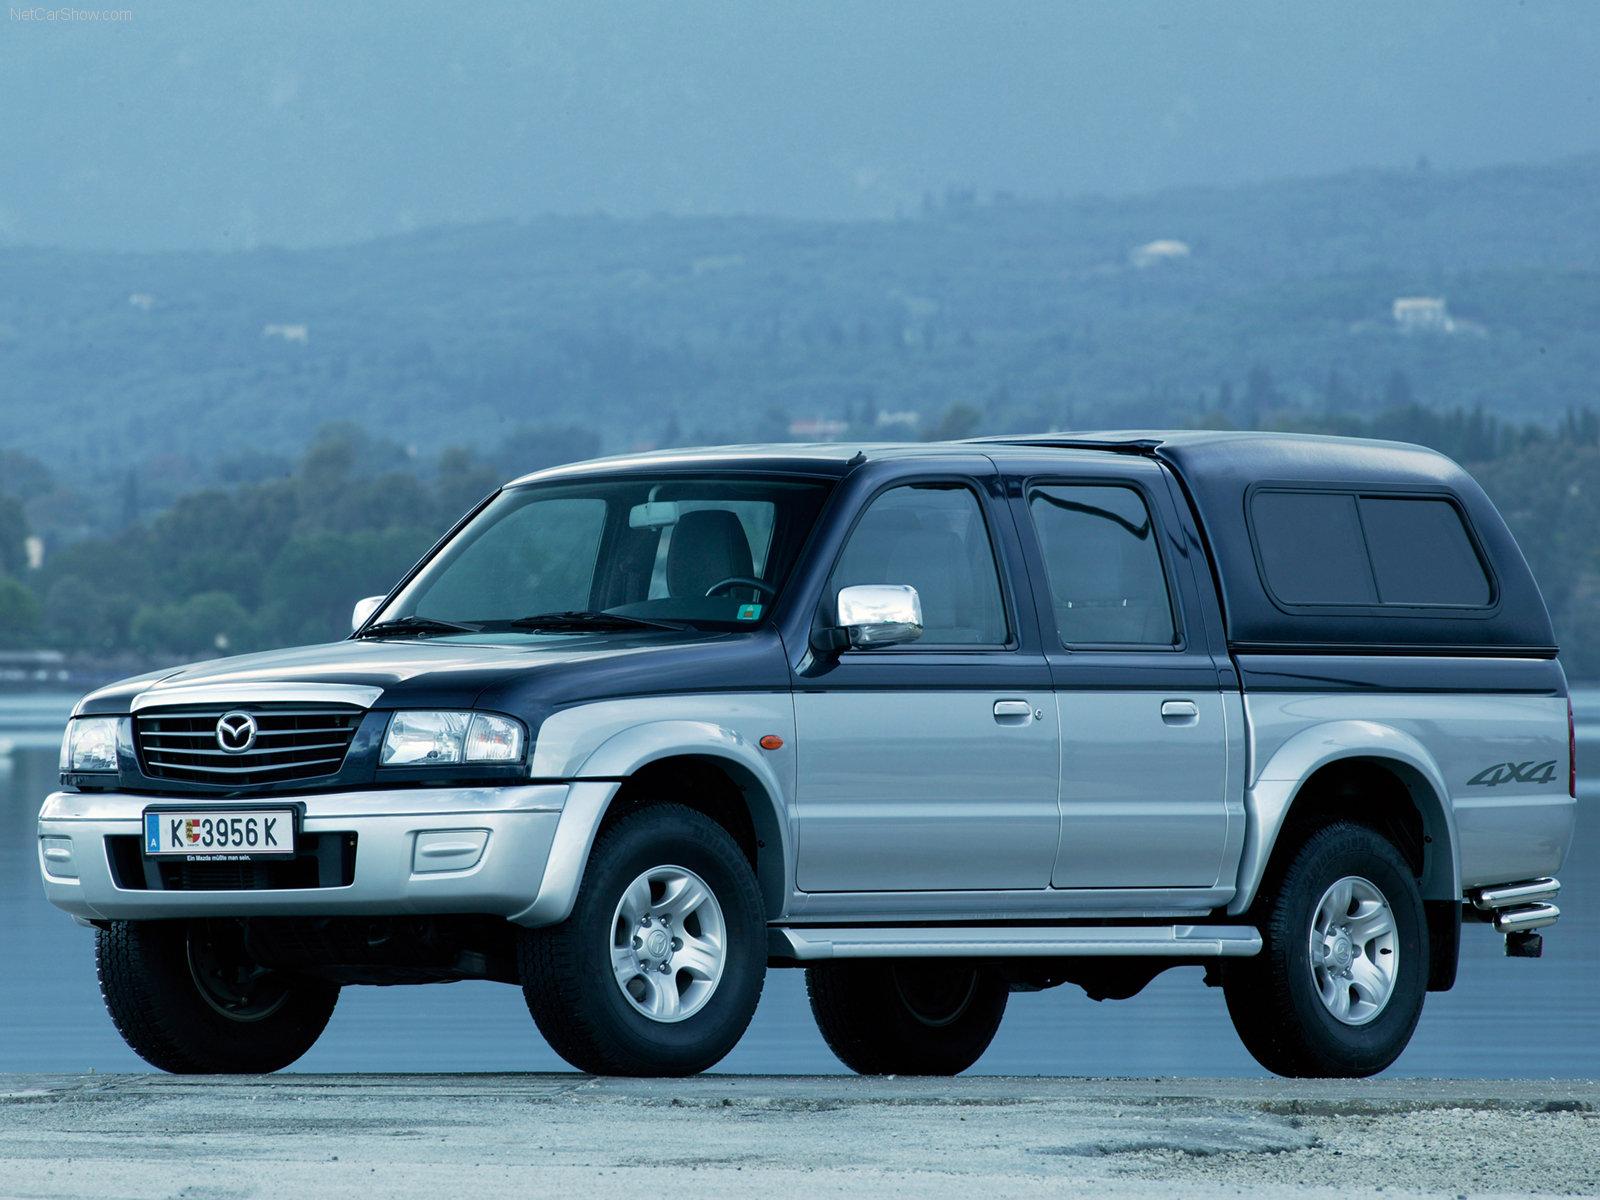 https://www.carsbase.com/photo/Mazda-B2500_mp34_pic_34816.jpg